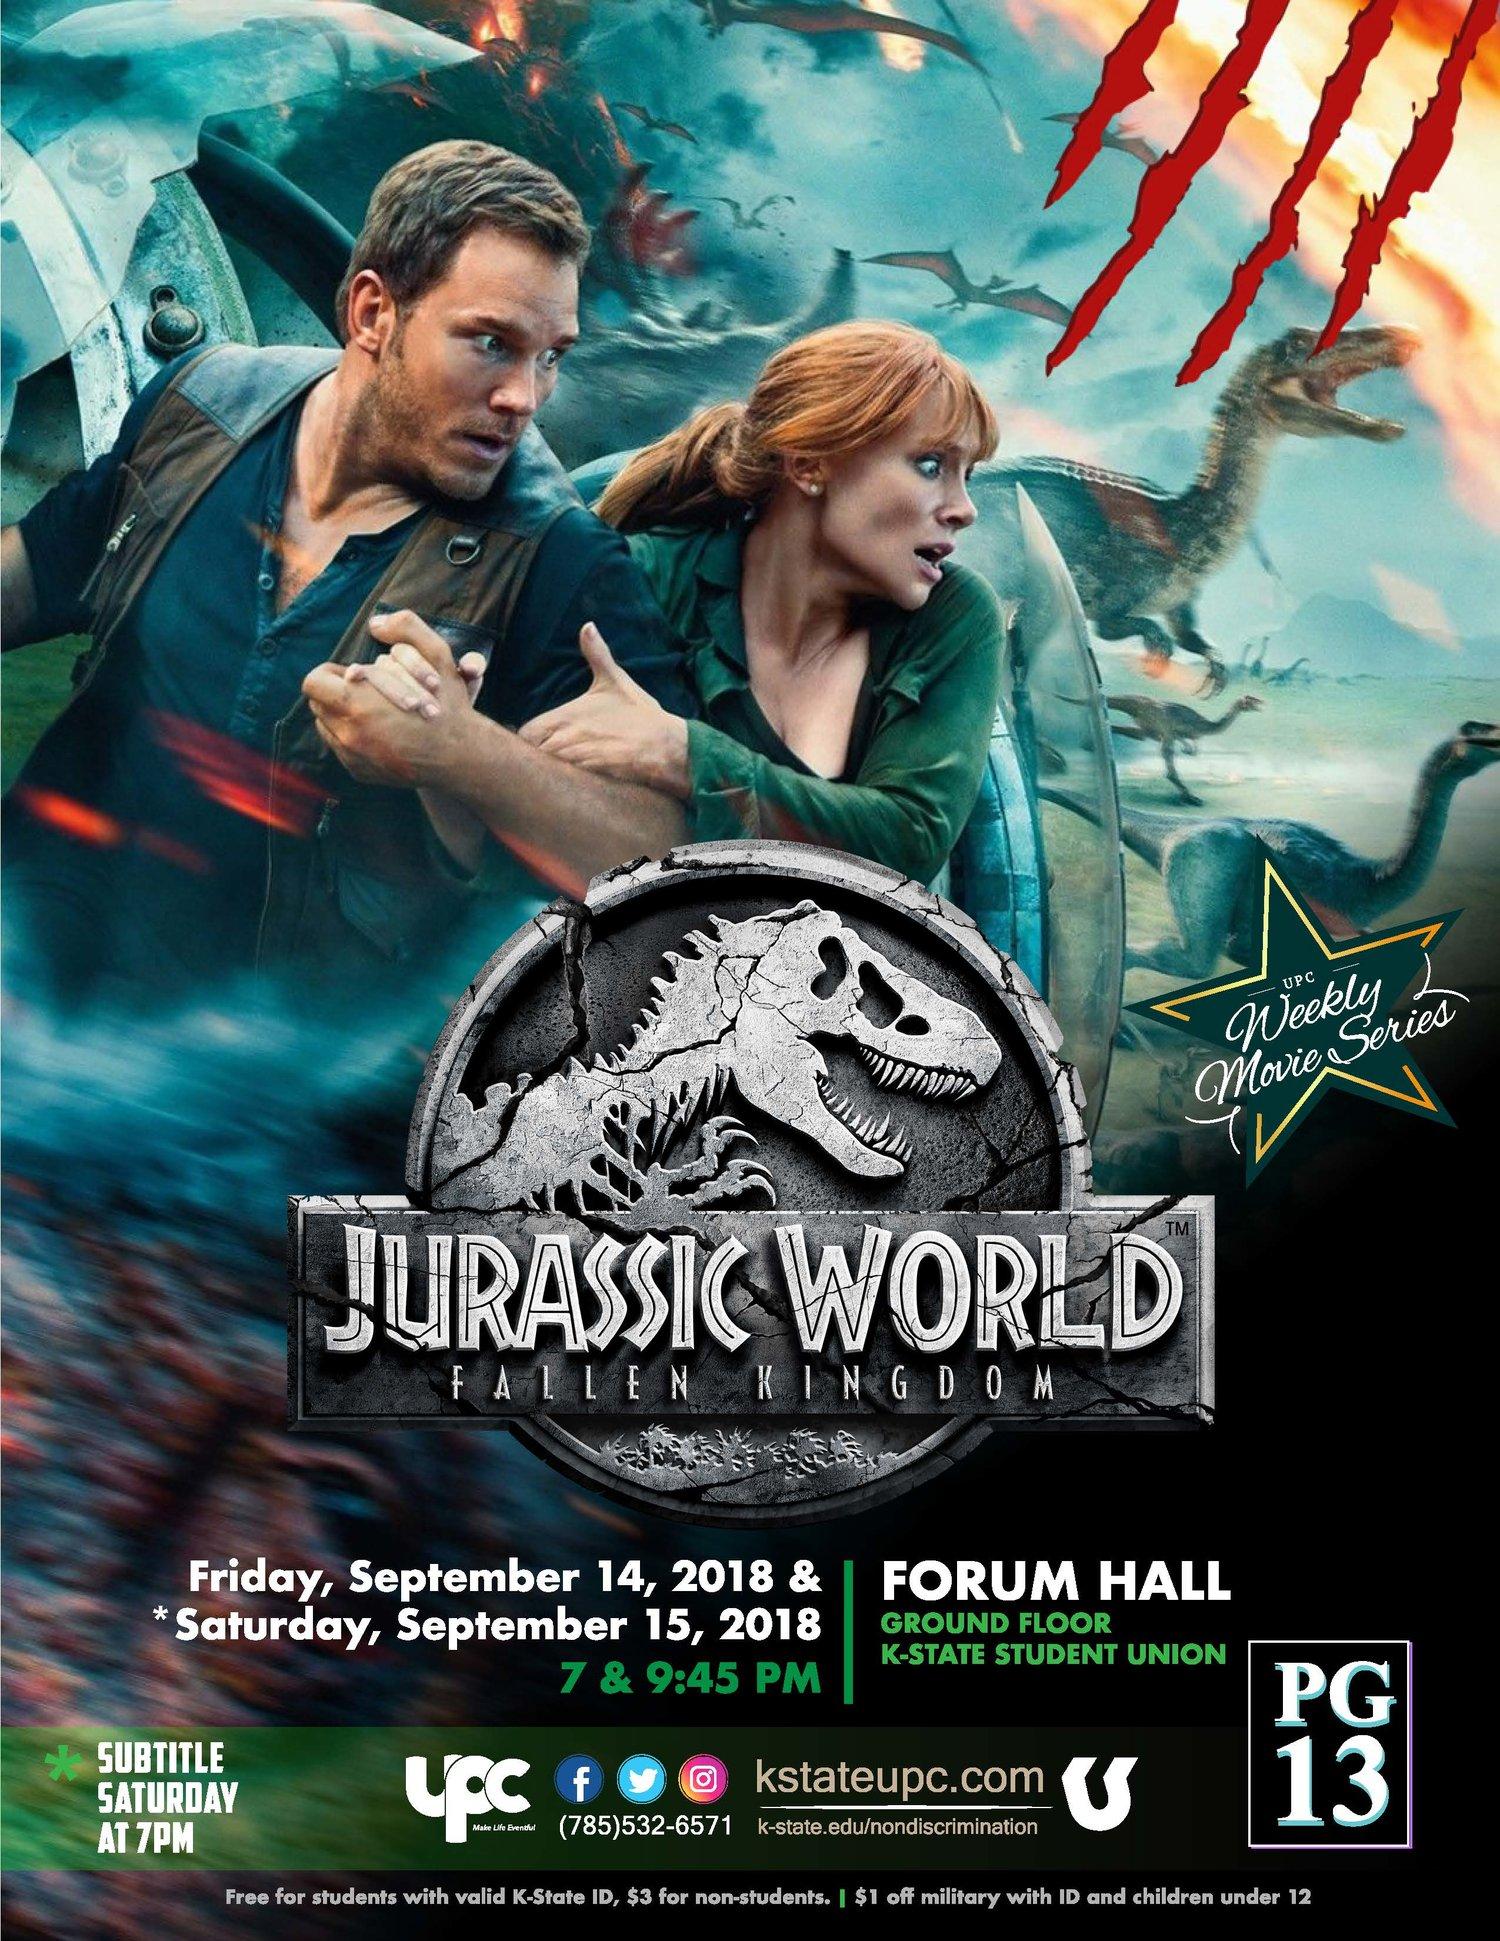 Film Jurassic World Fallen Kingdom Pg 13 K State Student Union